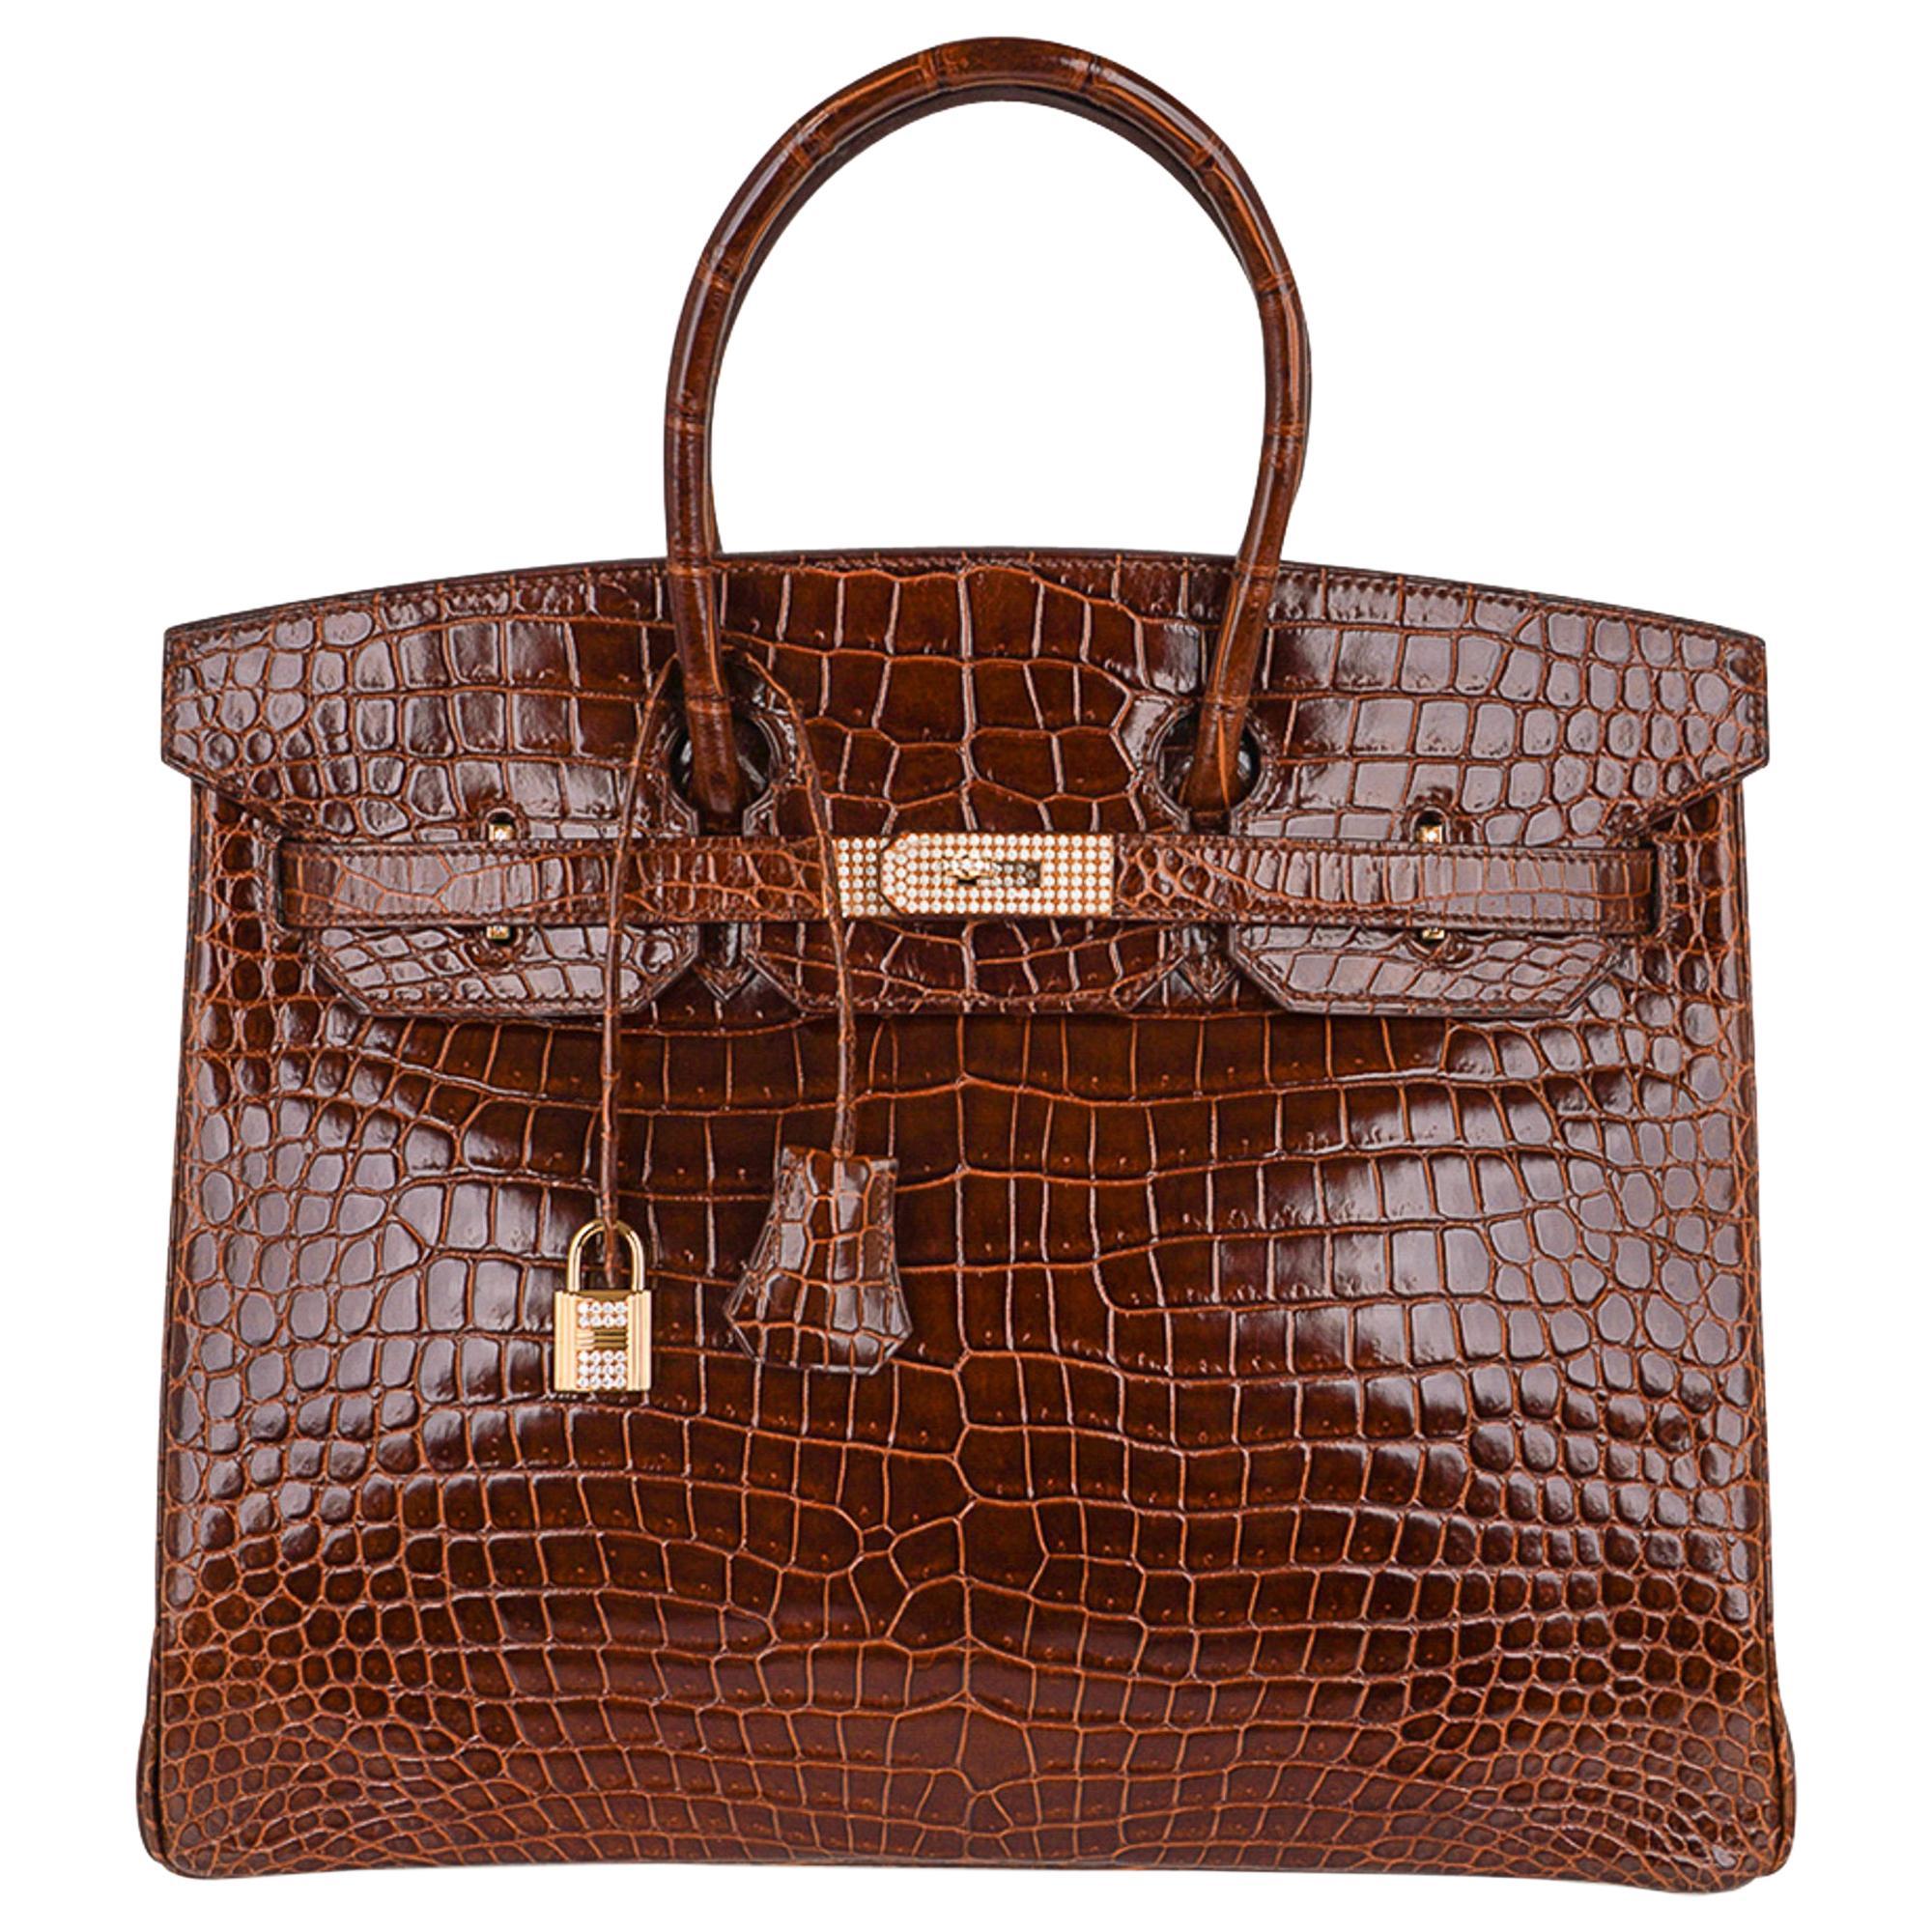 Hermes Birkin 35 Bag Diamond Miel Porosus Crocodile Gold Hardware